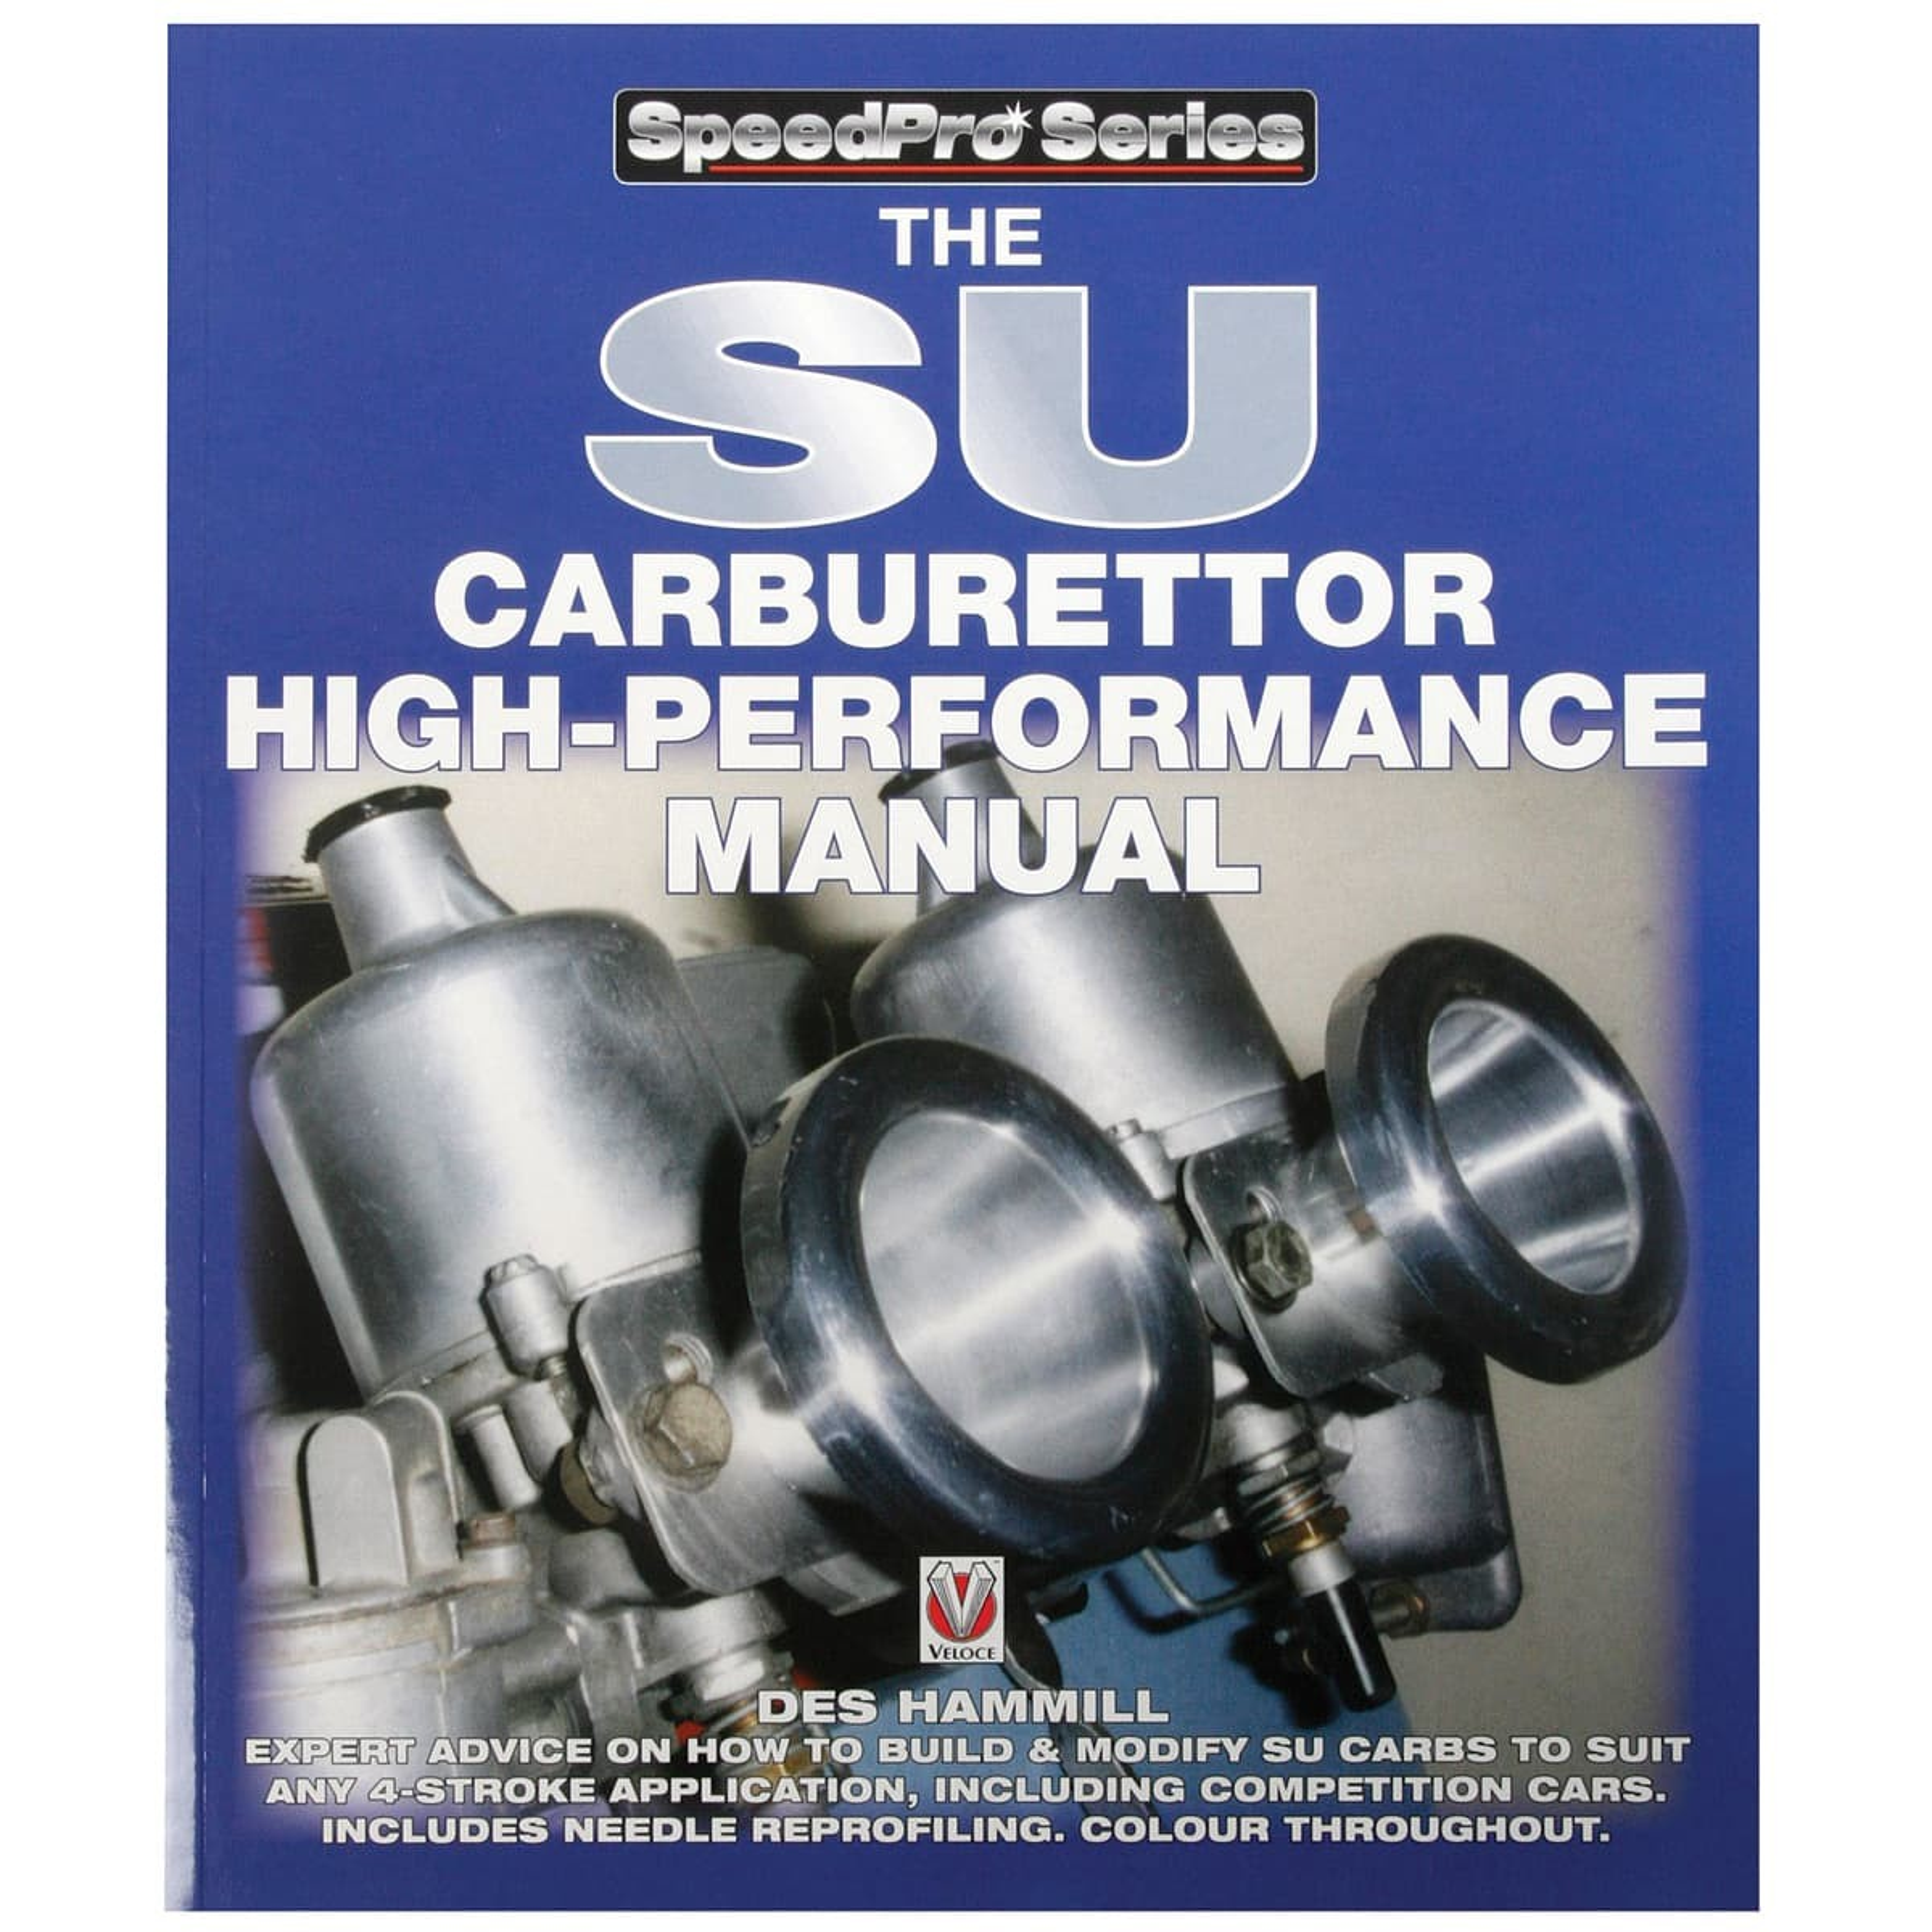 SU Carburettor High-Performance Manual